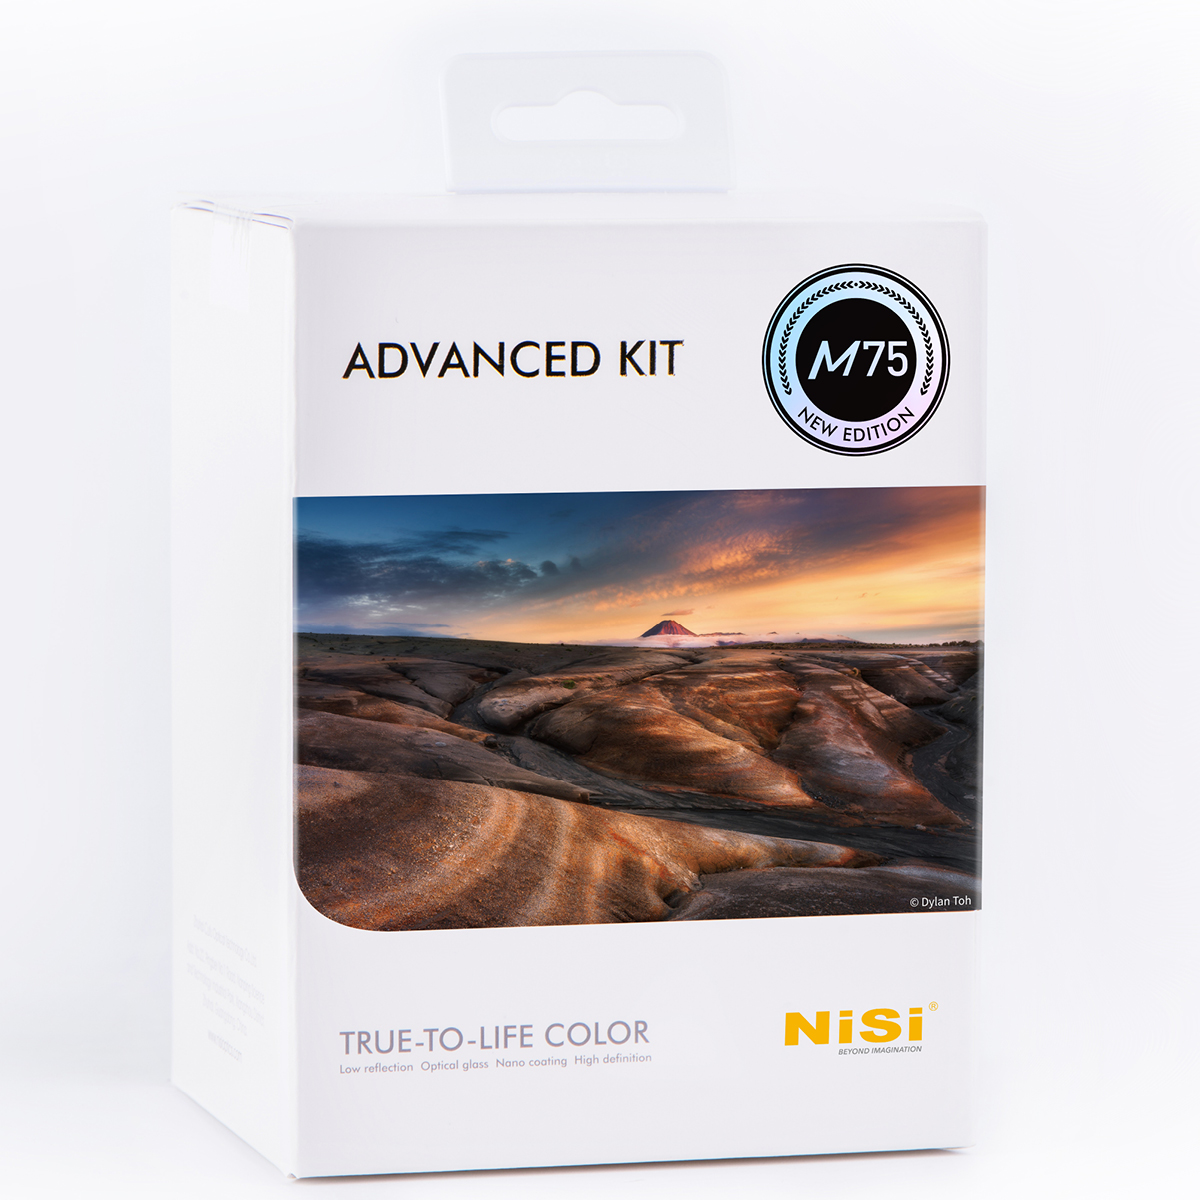 NiSi Advanced Kit M 75